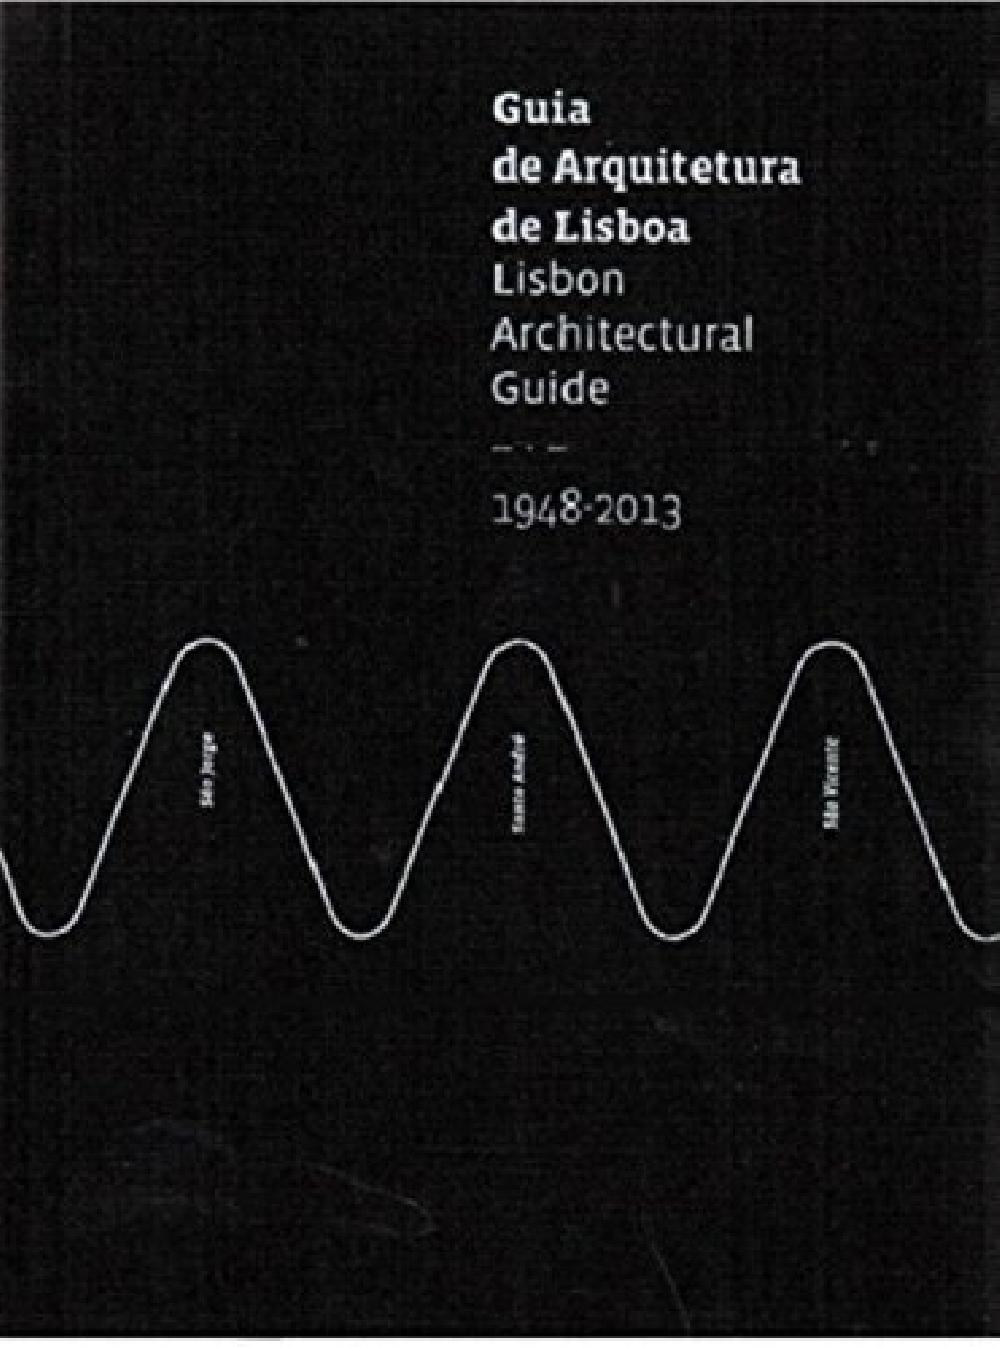 Lisbon Architectural Guide 1948-2013